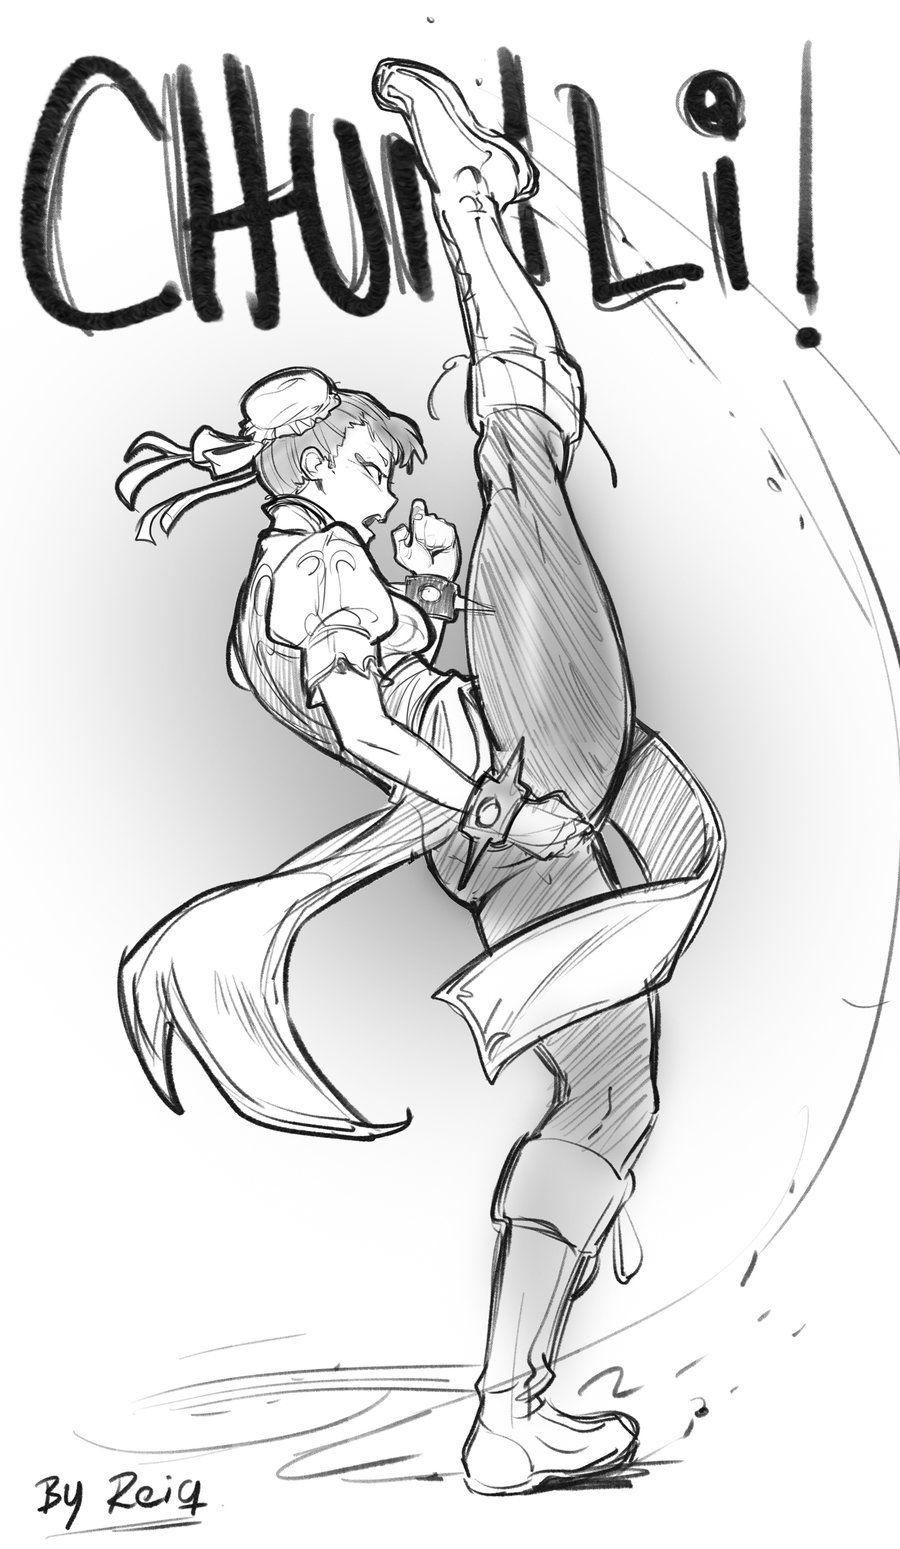 Street Fighter Chun Li Kicks By Reiq Desenhos Incriveis